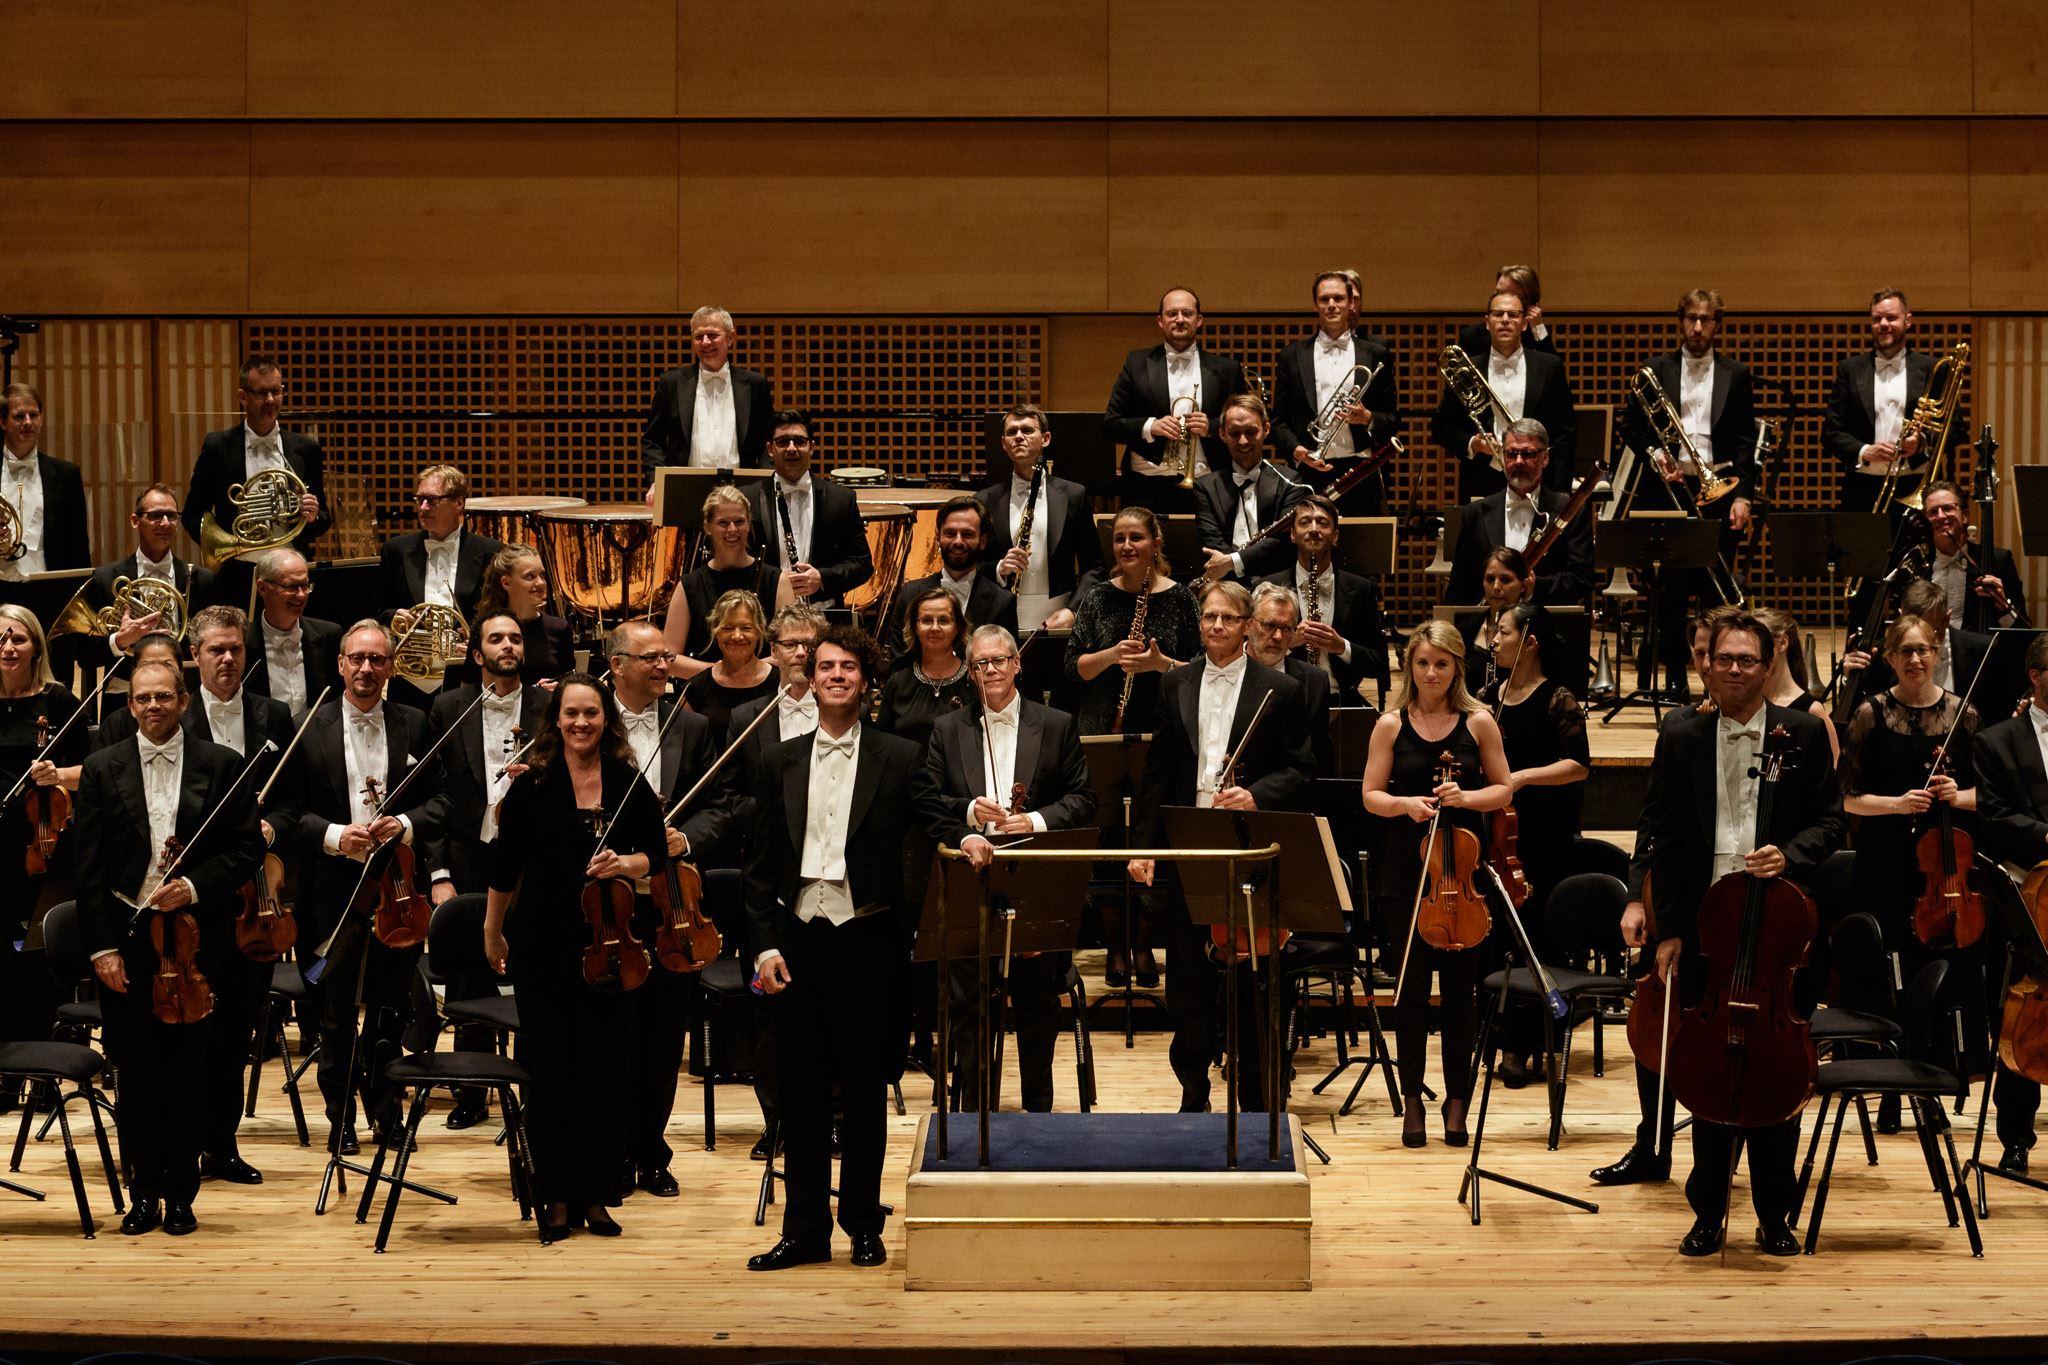 Opera på Österbybruk - Orfeus och Eurydike